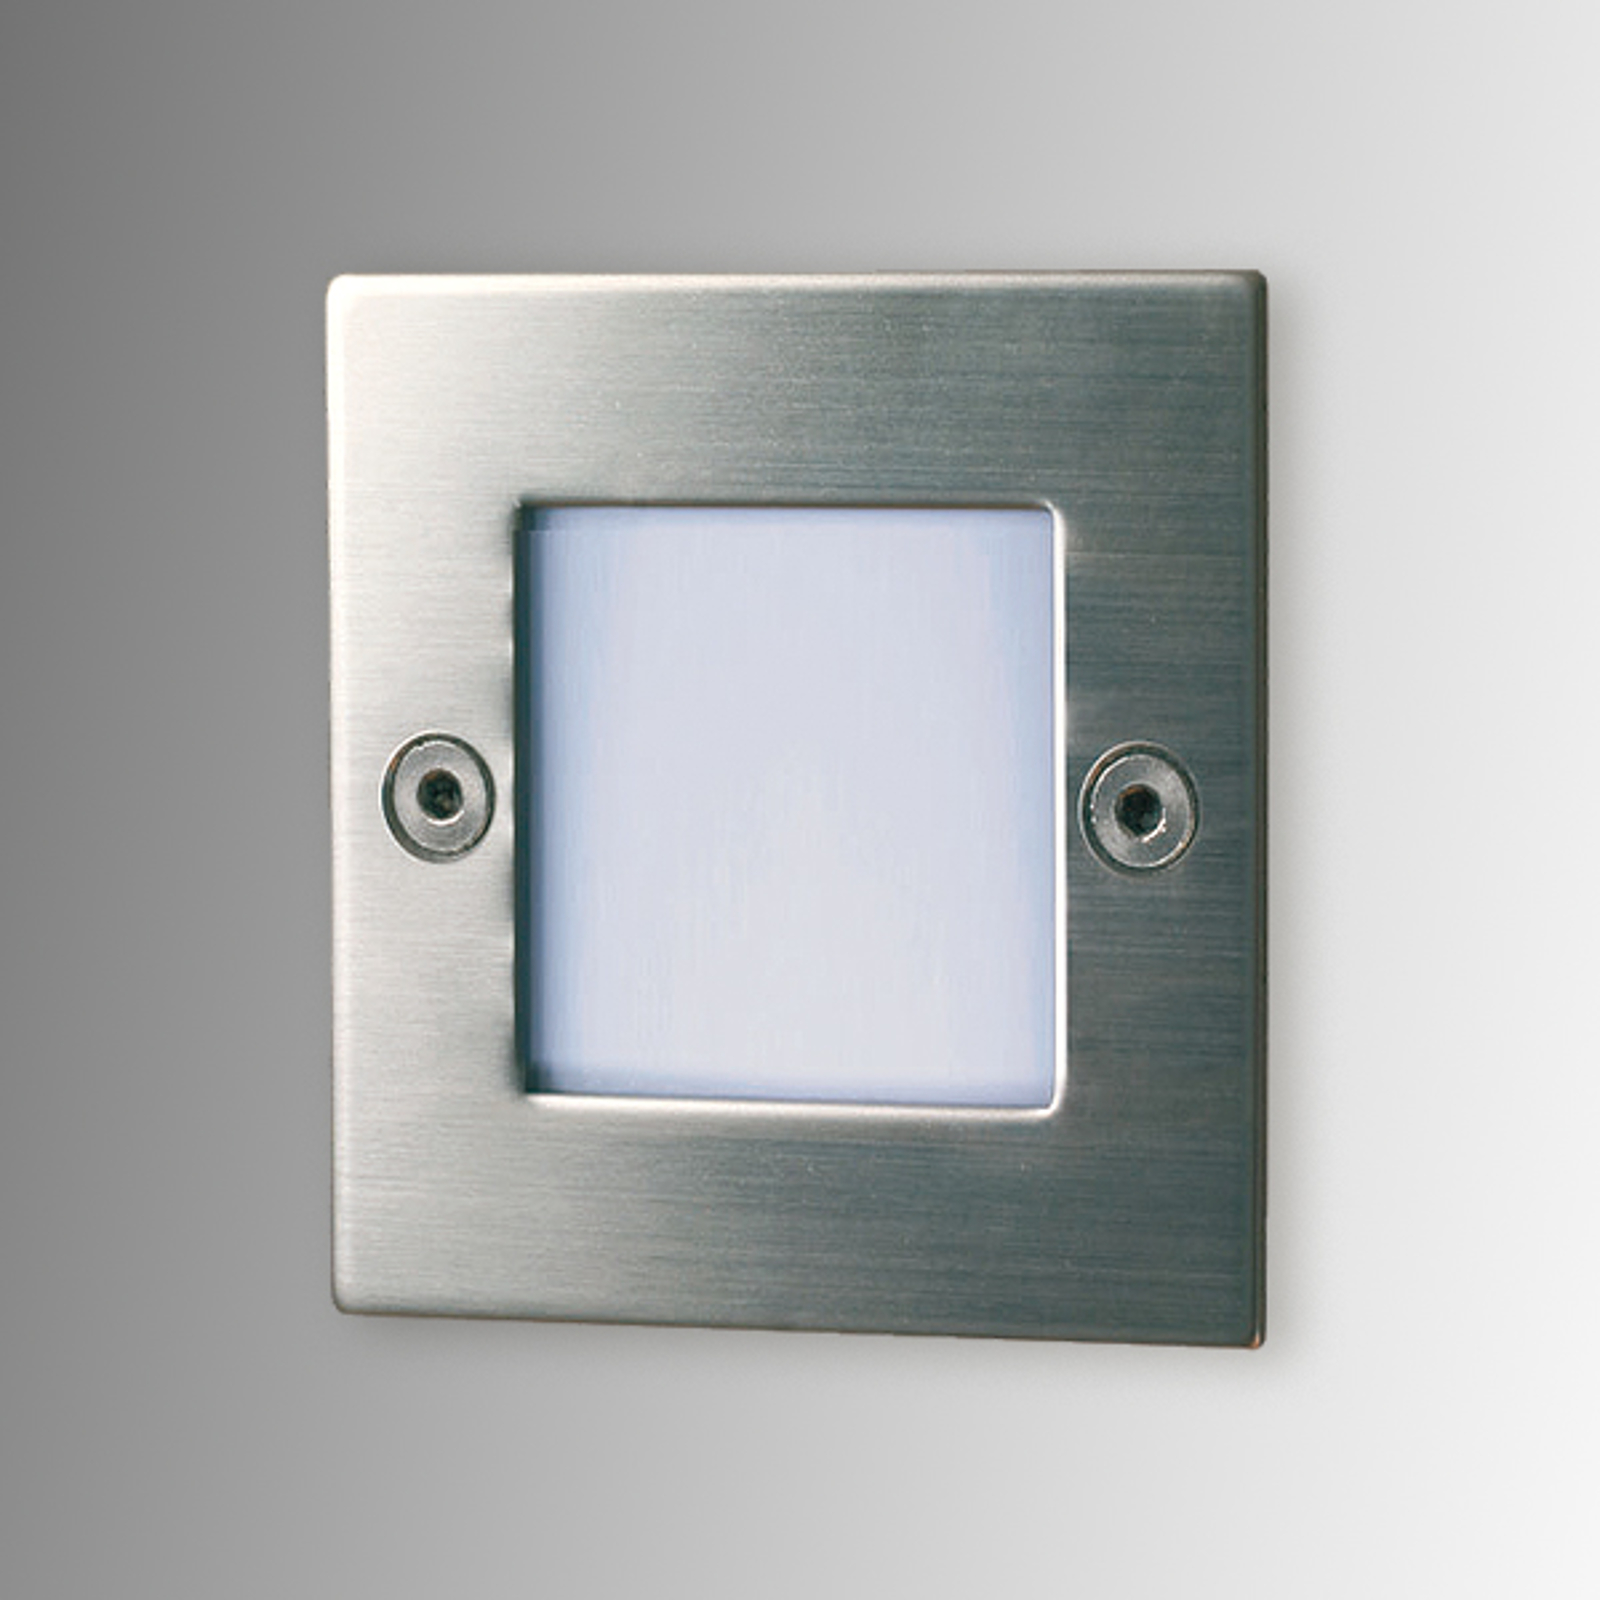 Quadratische LED-Einbauleuchte Lis